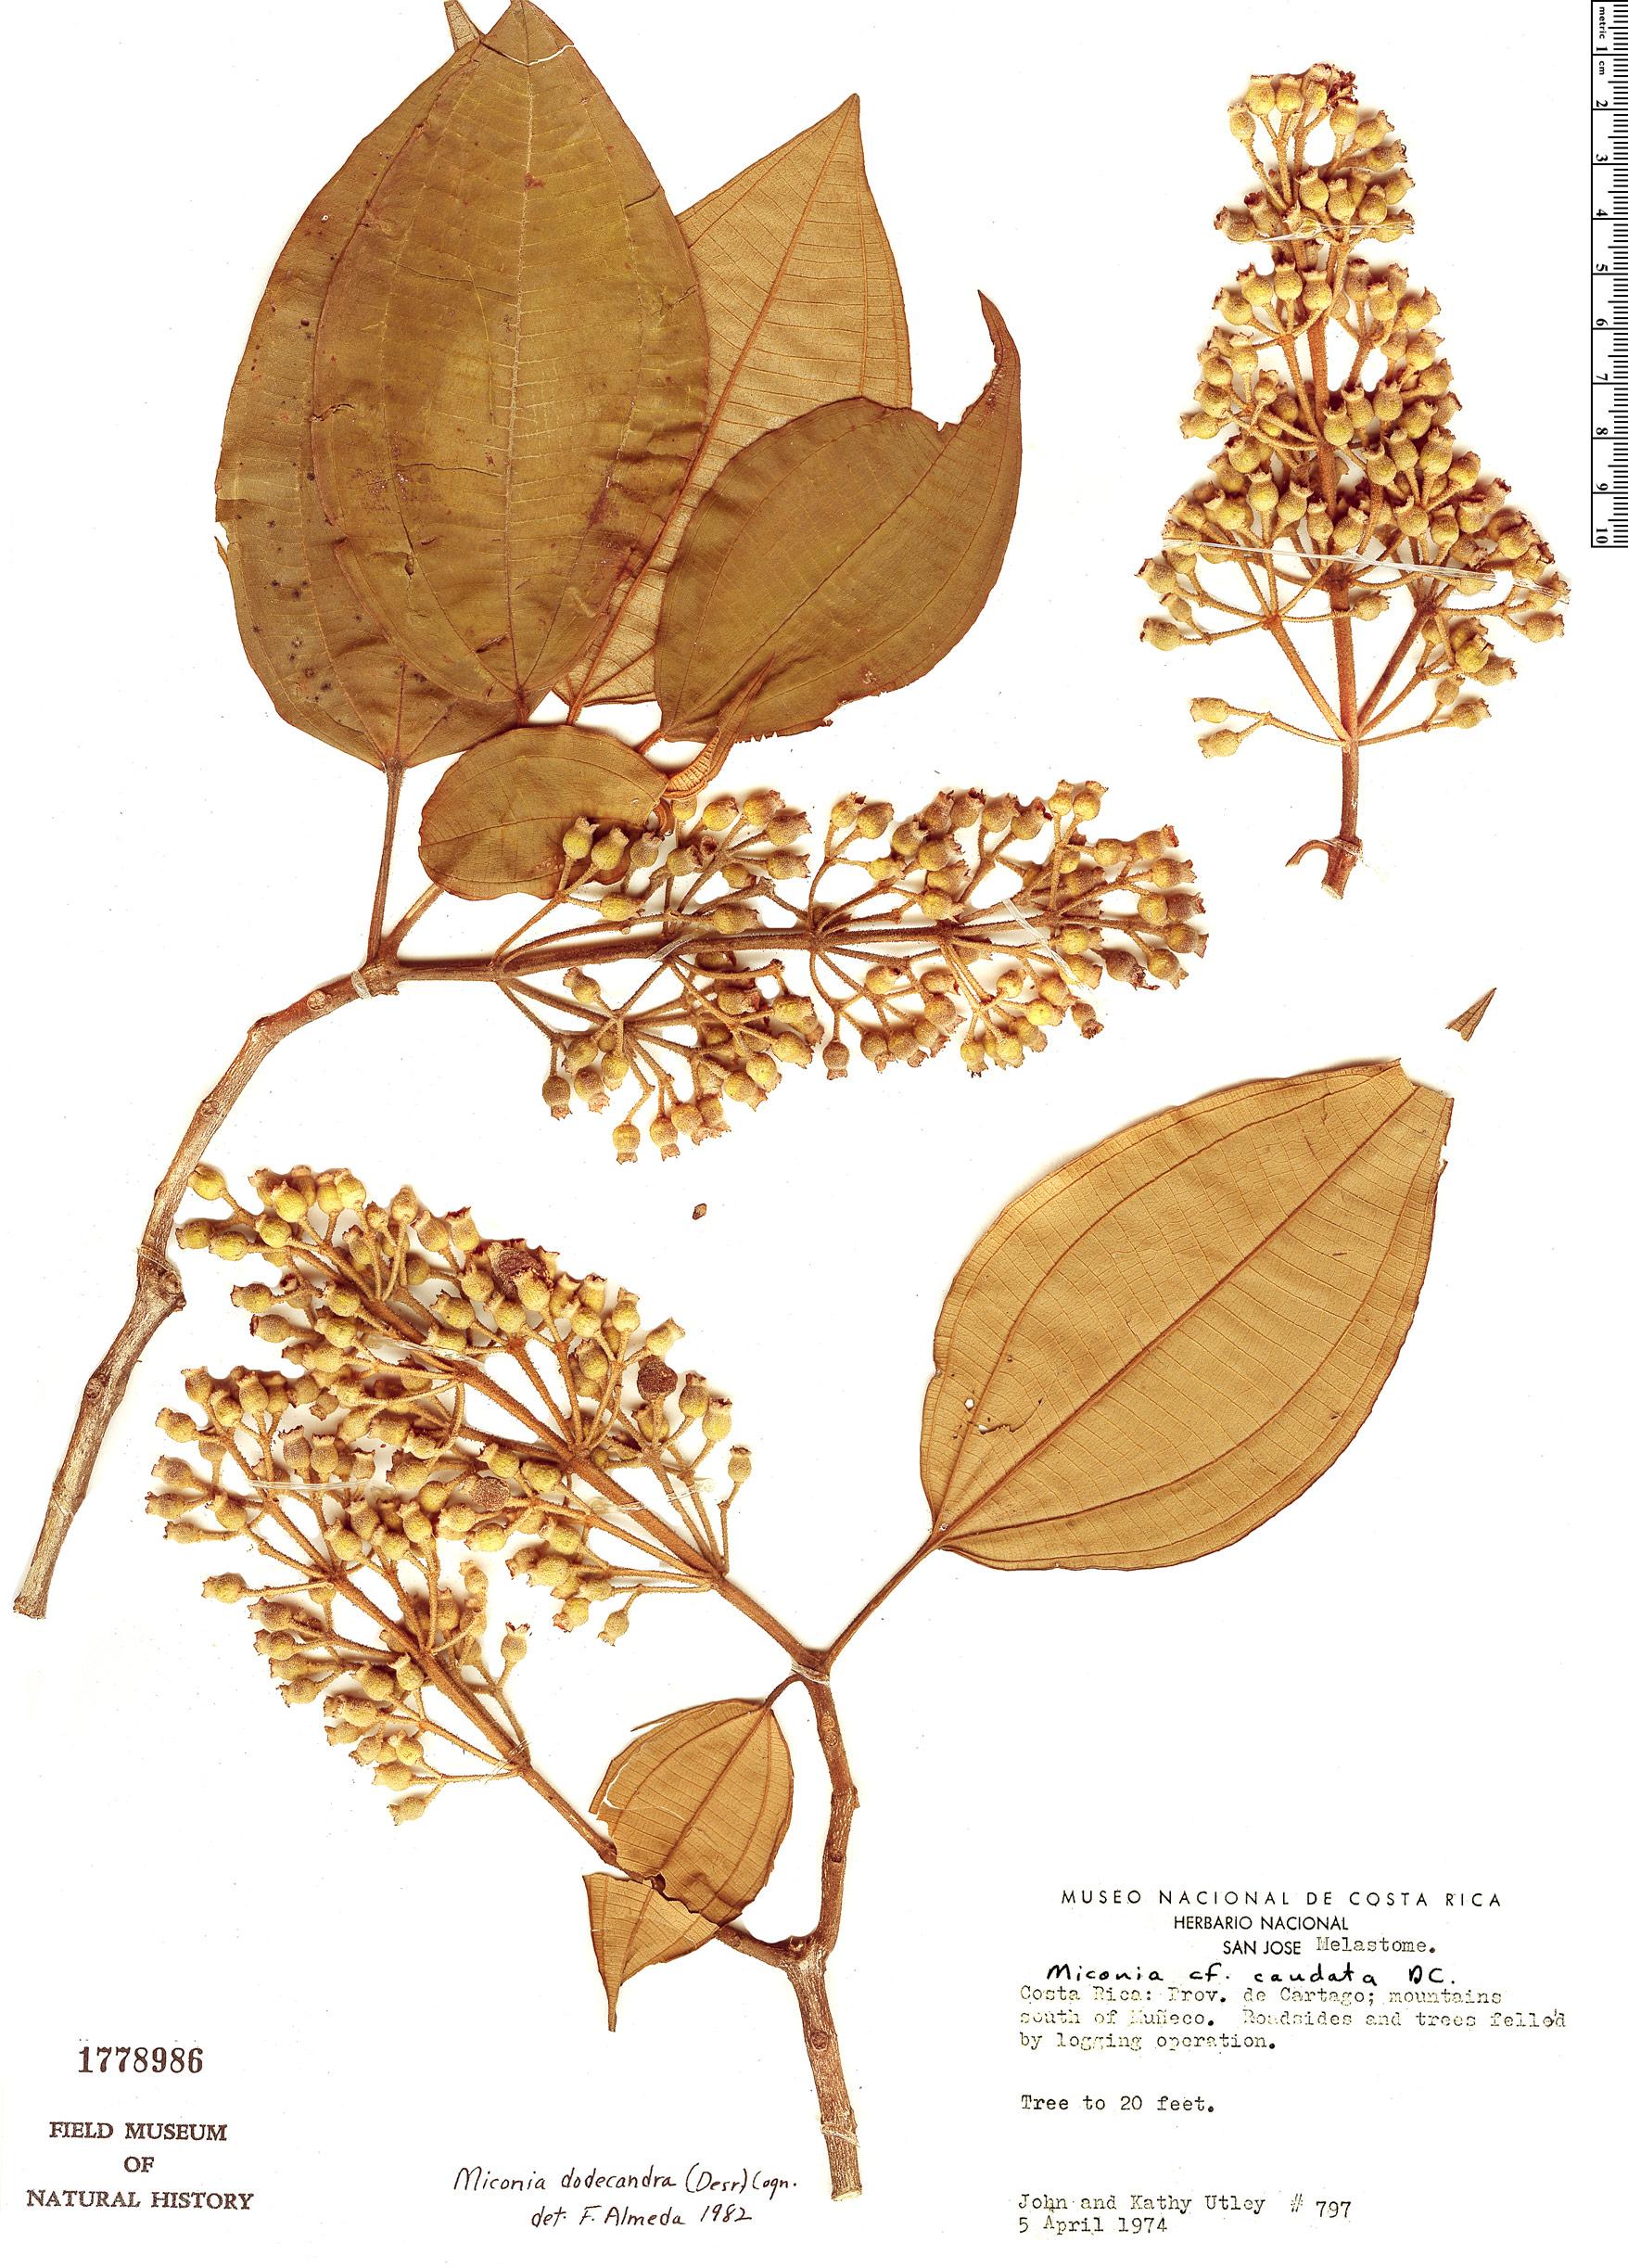 Specimen: Miconia dodecandra